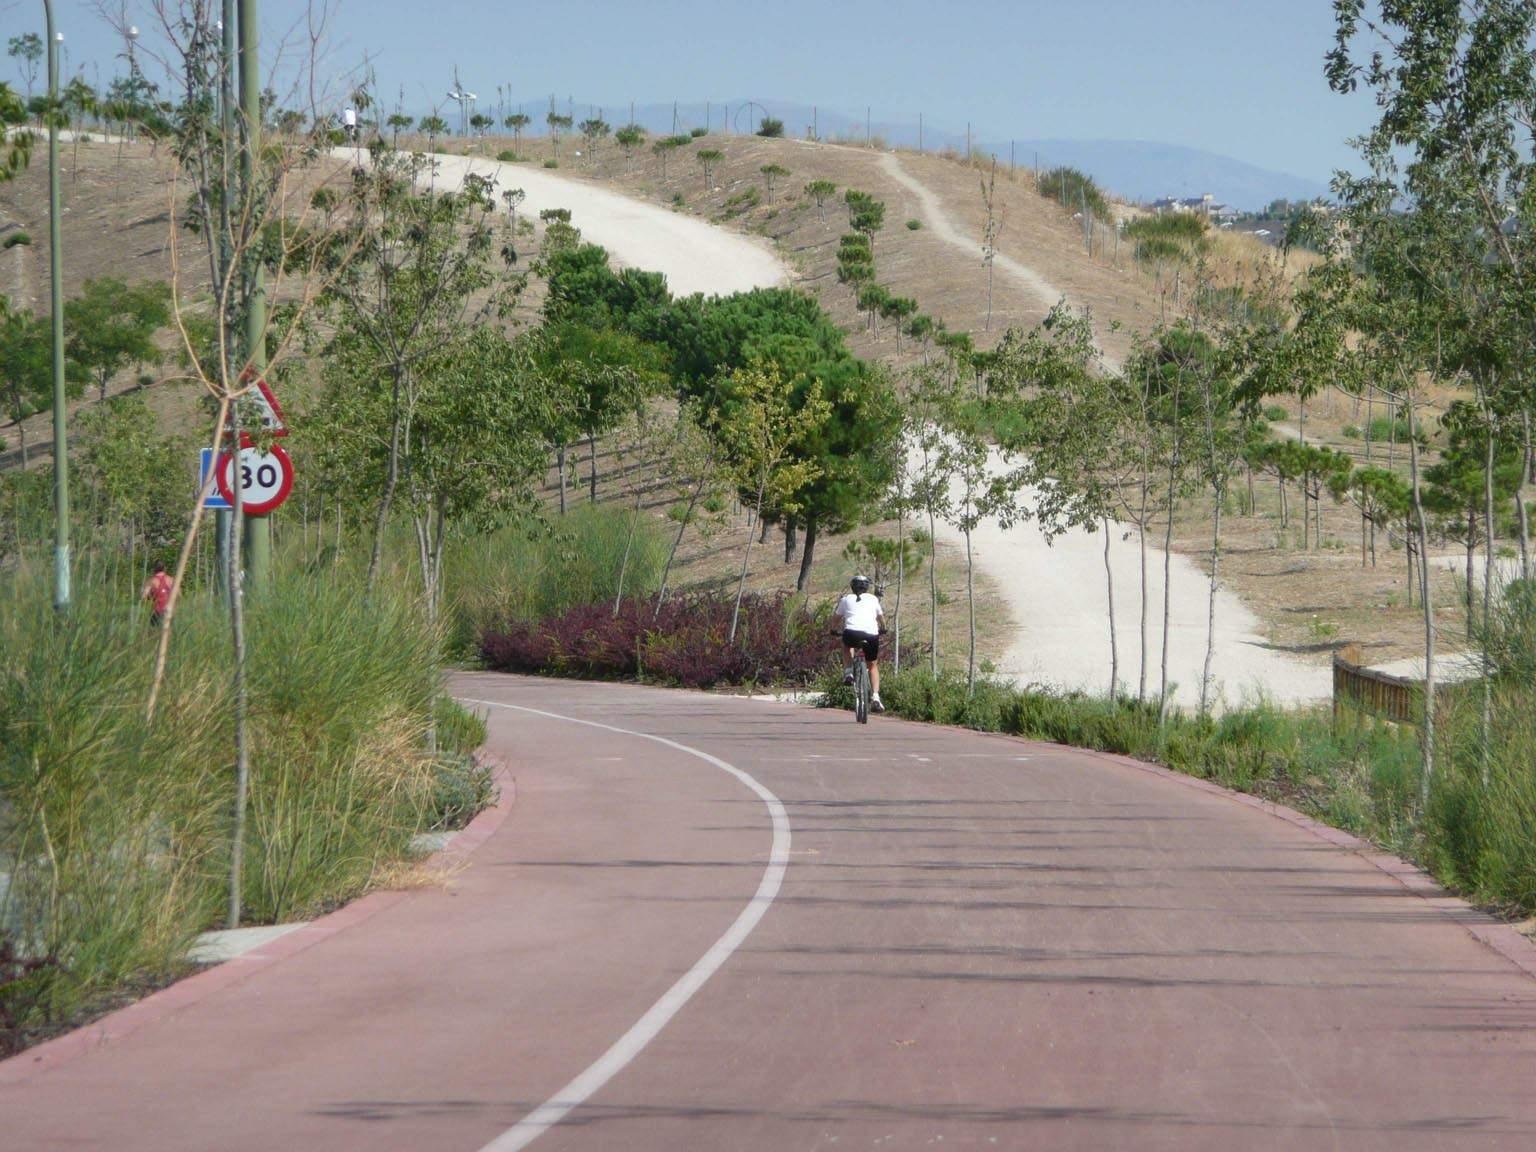 Anillo ciclista lfon set de todo un poco - Anillo verde ciclista madrid mapa ...